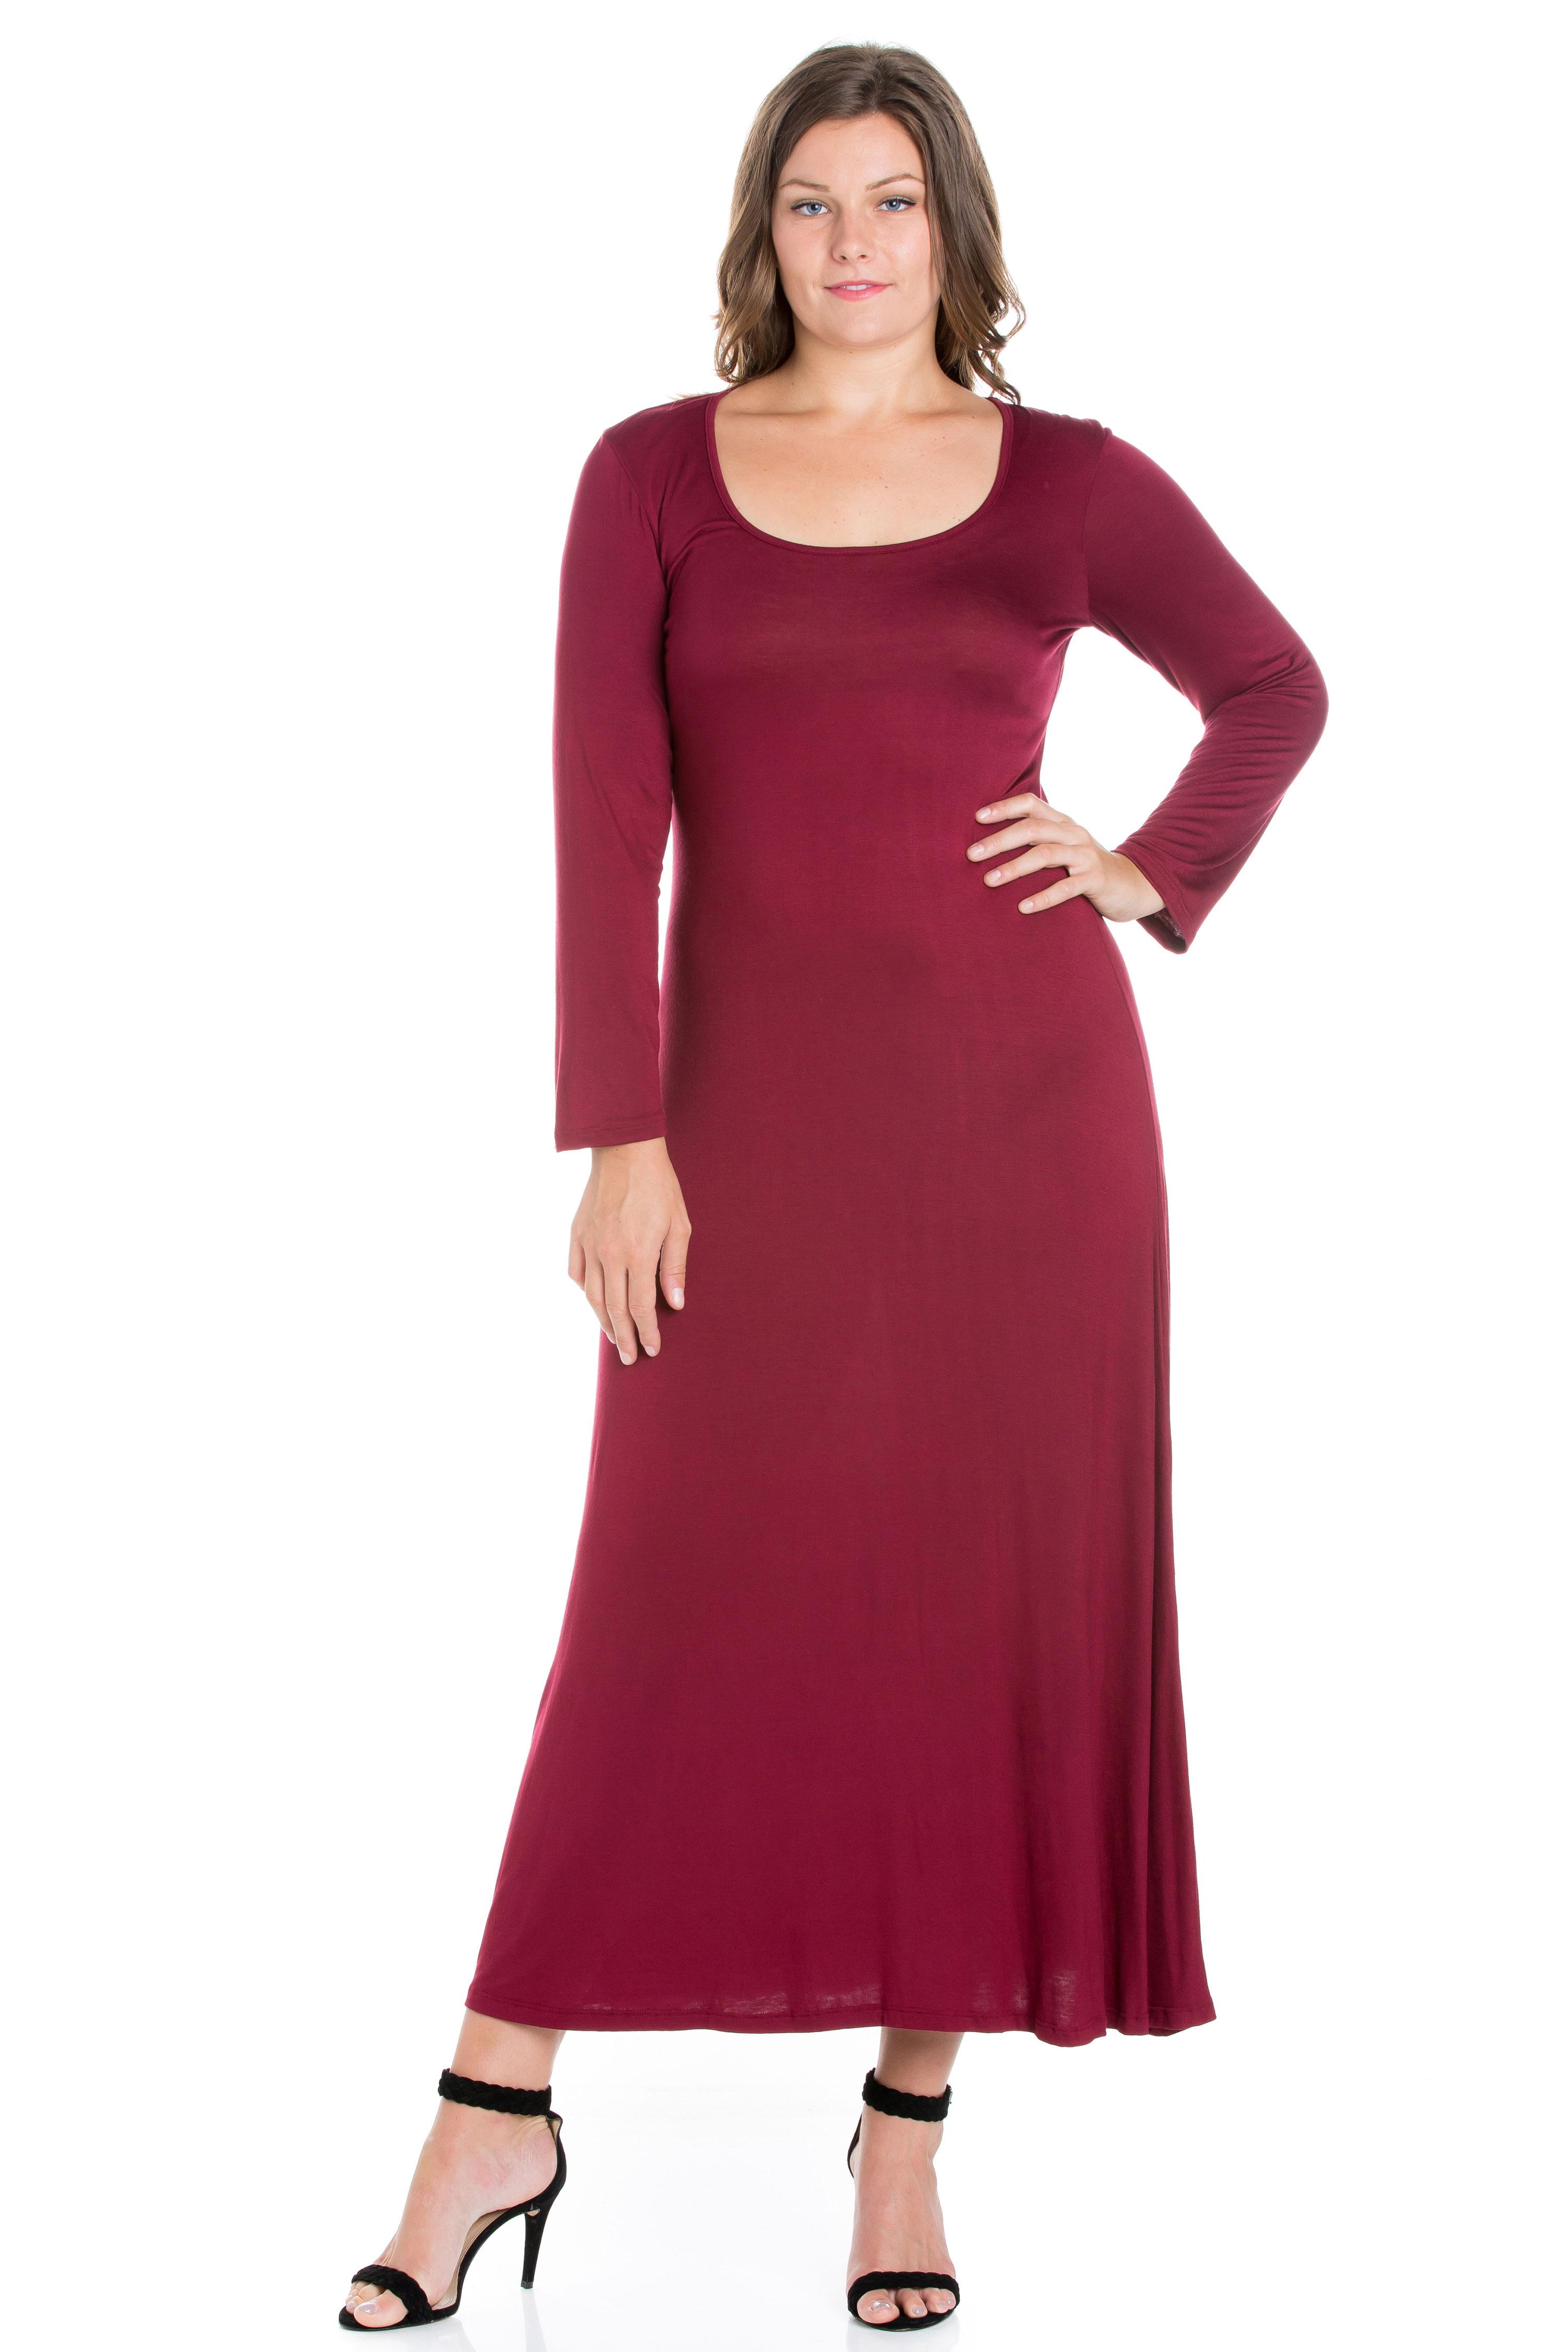 24seven Comfort Apparel Women\'s Long Sleeve Plus Size Maxi Dress